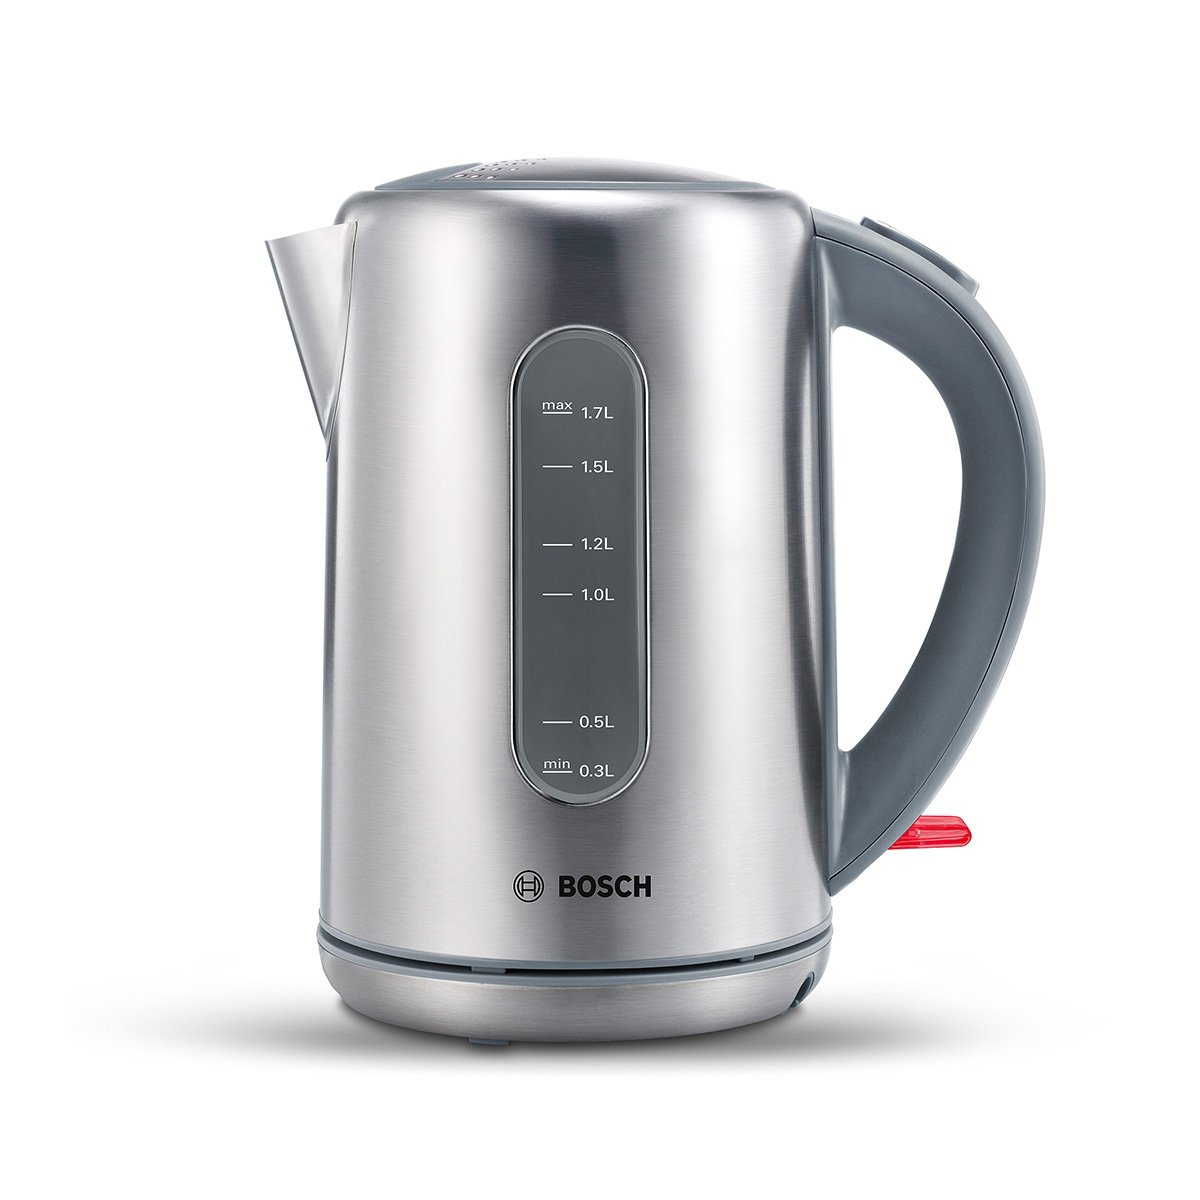 Bosch TWK7901 Wasserkocher, Dampfstopp-Automatik, entnehmen Kalkfilter, 2200 W, edelstahl / hellgrau